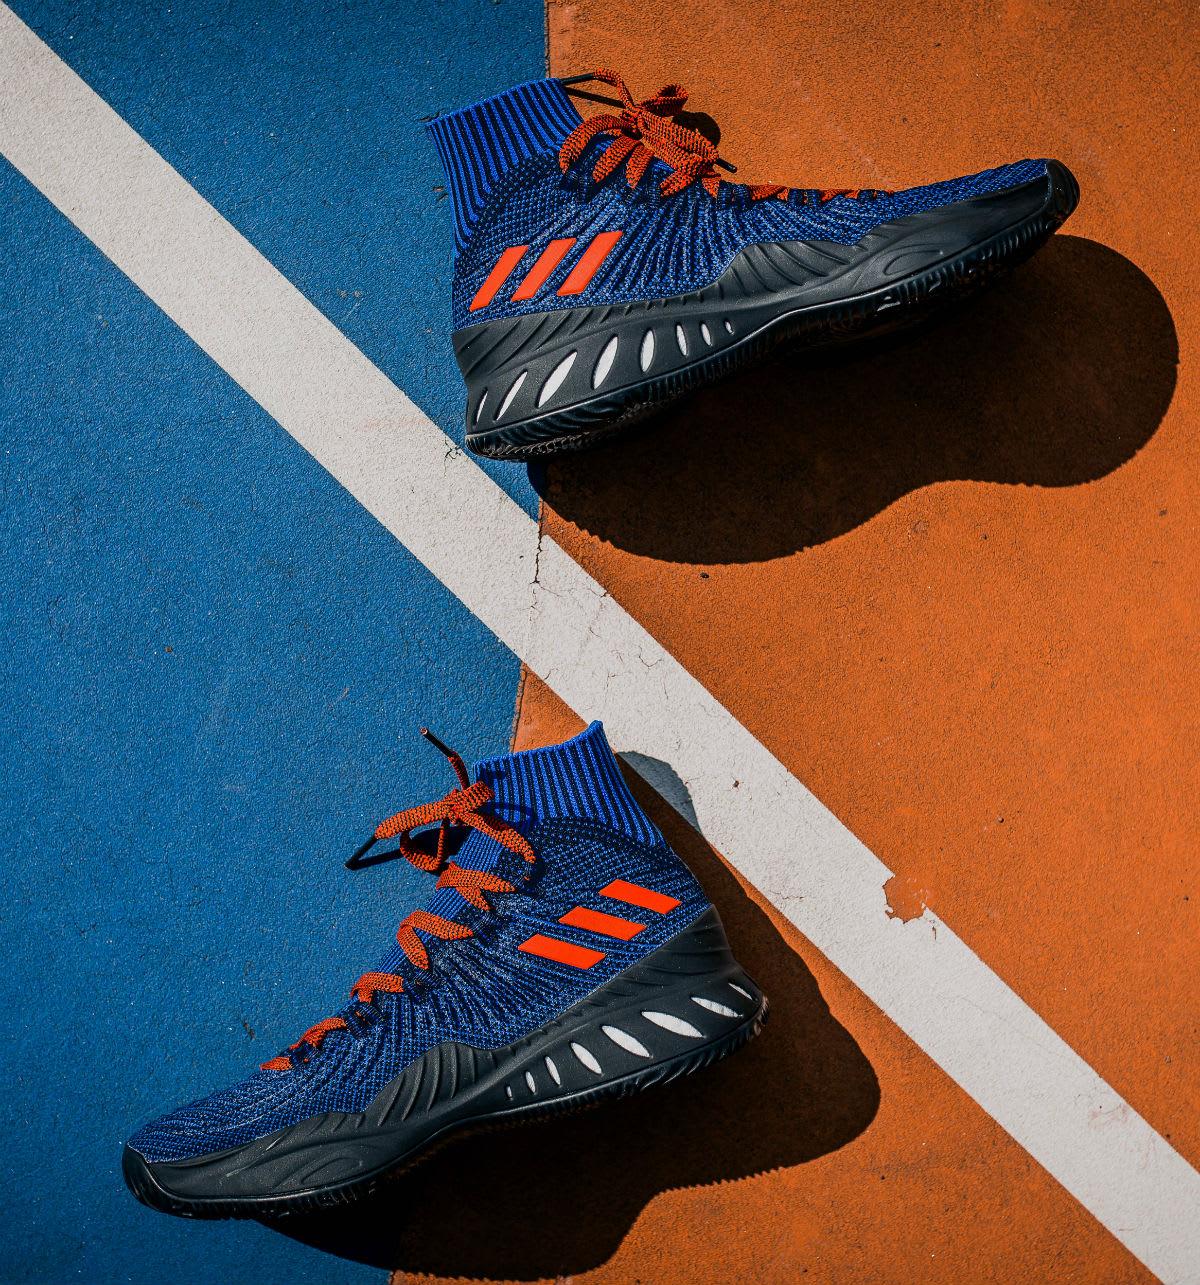 Adidas Crazy Explosive Kristaps Porzingis PE Release Date (3)